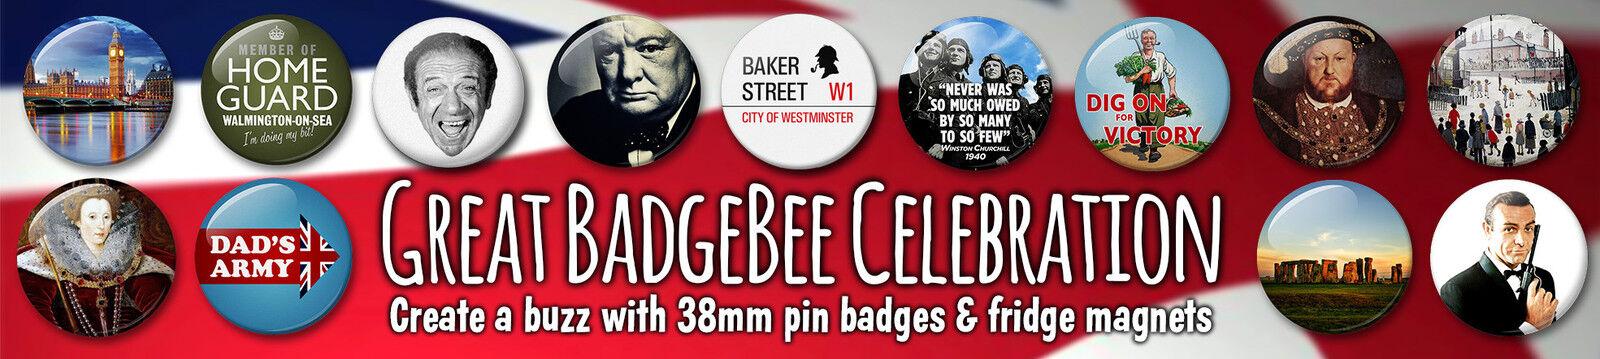 BadgeBee Badges